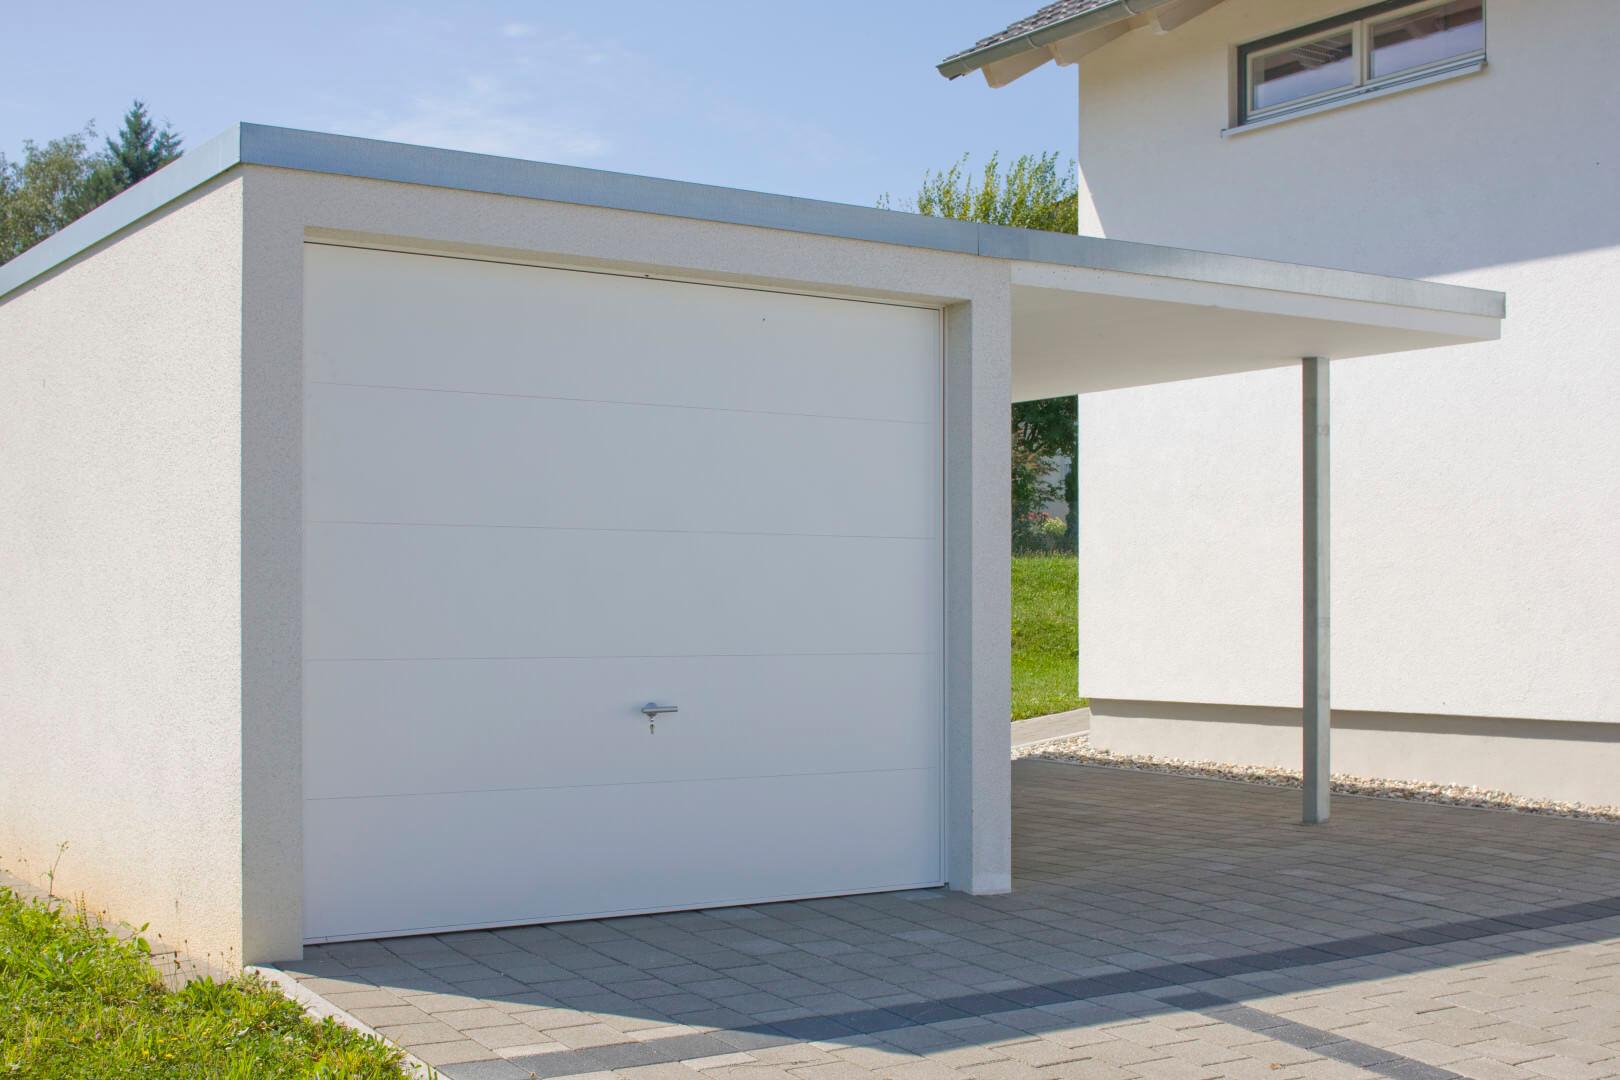 beton carports von beton kemmler. Black Bedroom Furniture Sets. Home Design Ideas